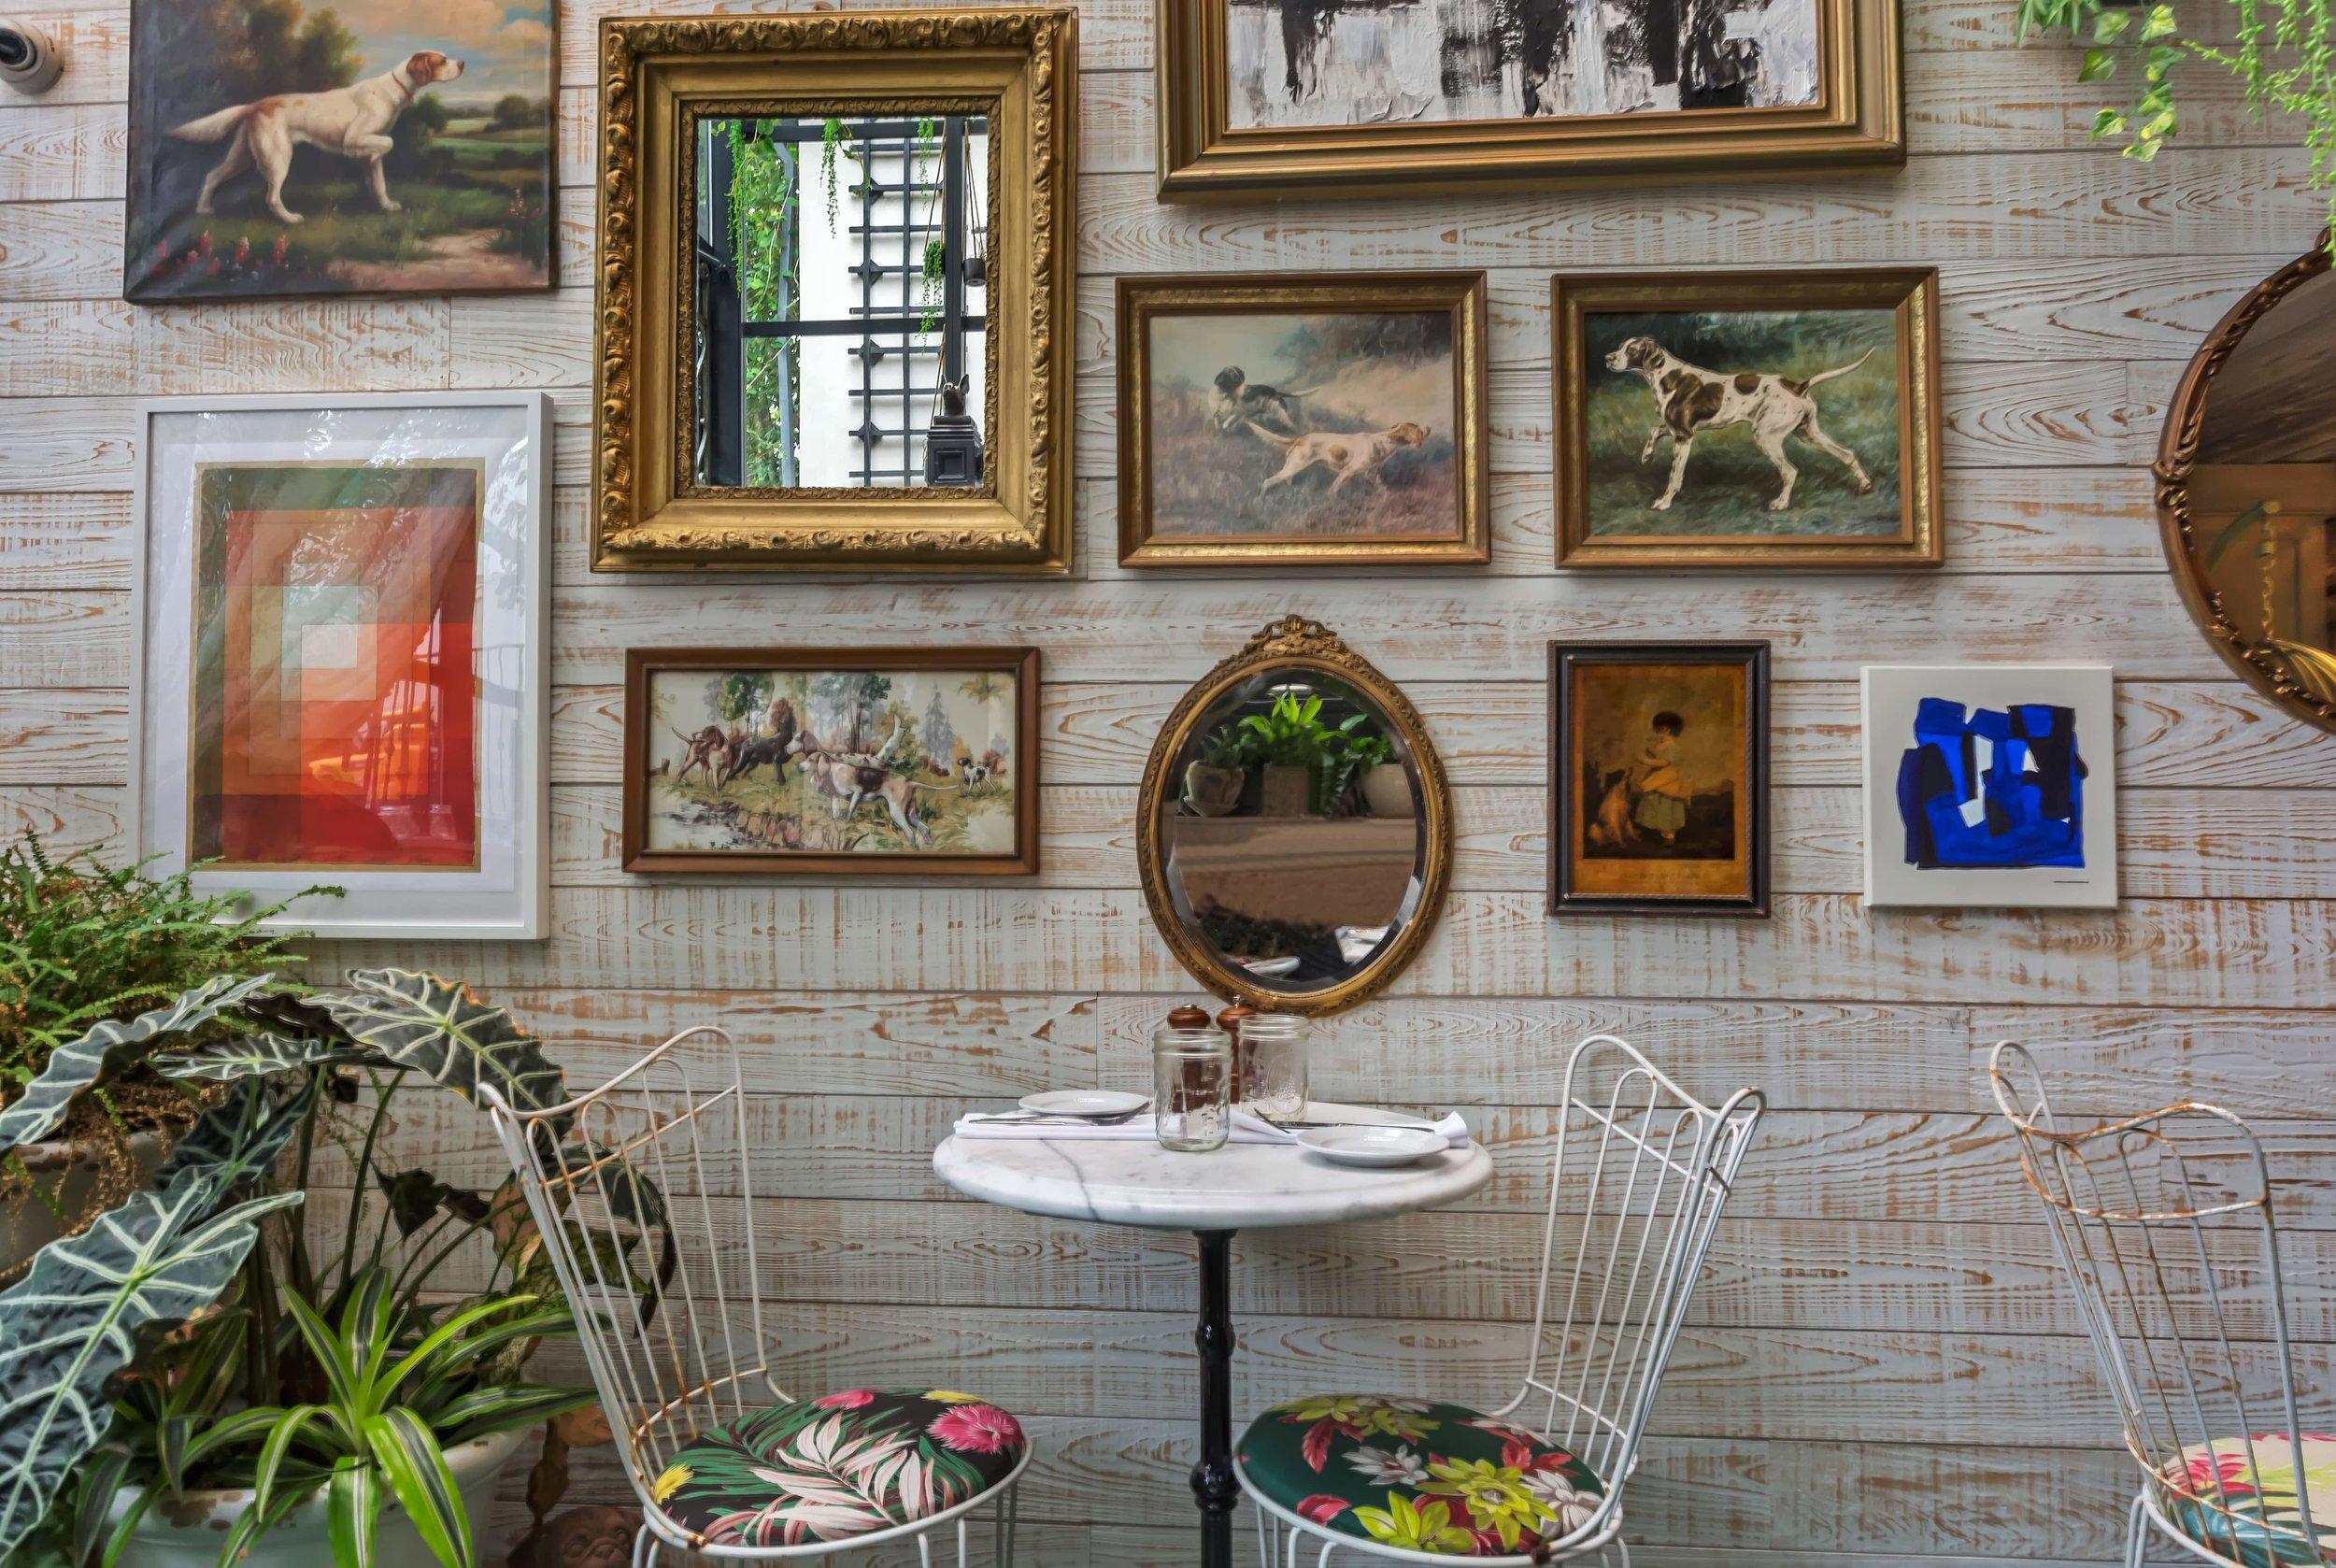 White Dog Cafe Francesca Ragucci (17)-min.jpg